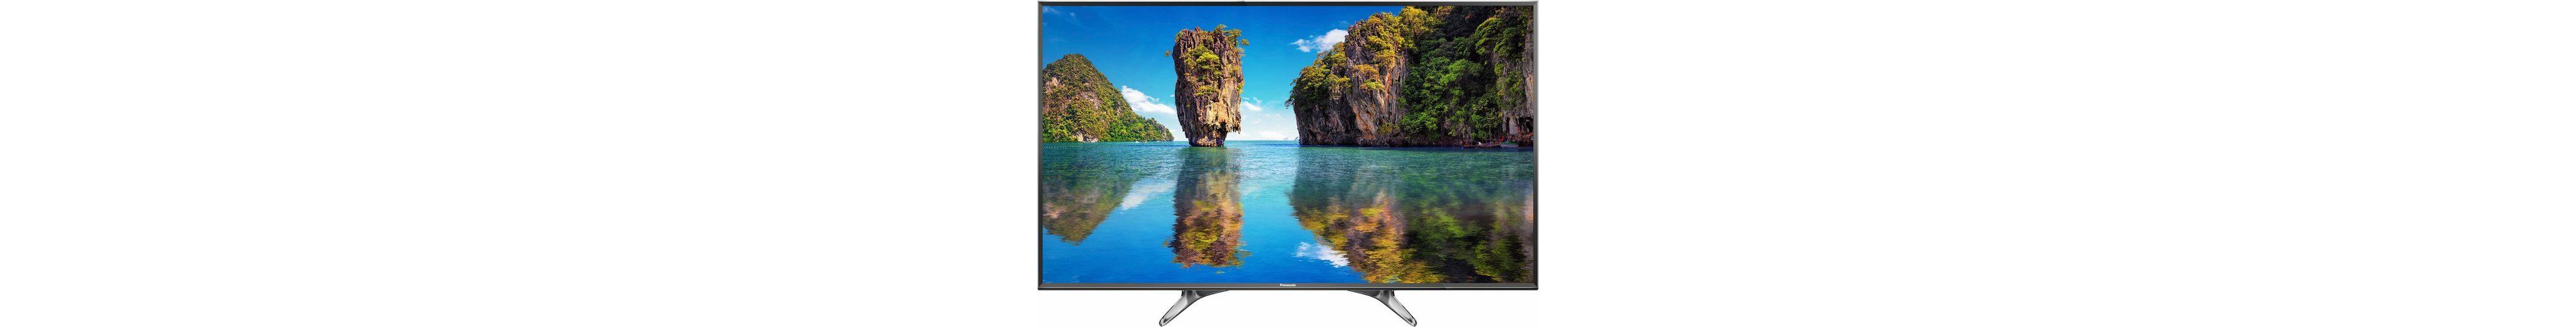 Panasonic TX-55DXW604, LED Fernseher, 139 cm (55 Zoll), 2160p (4K Ultra HD), Smart-TV